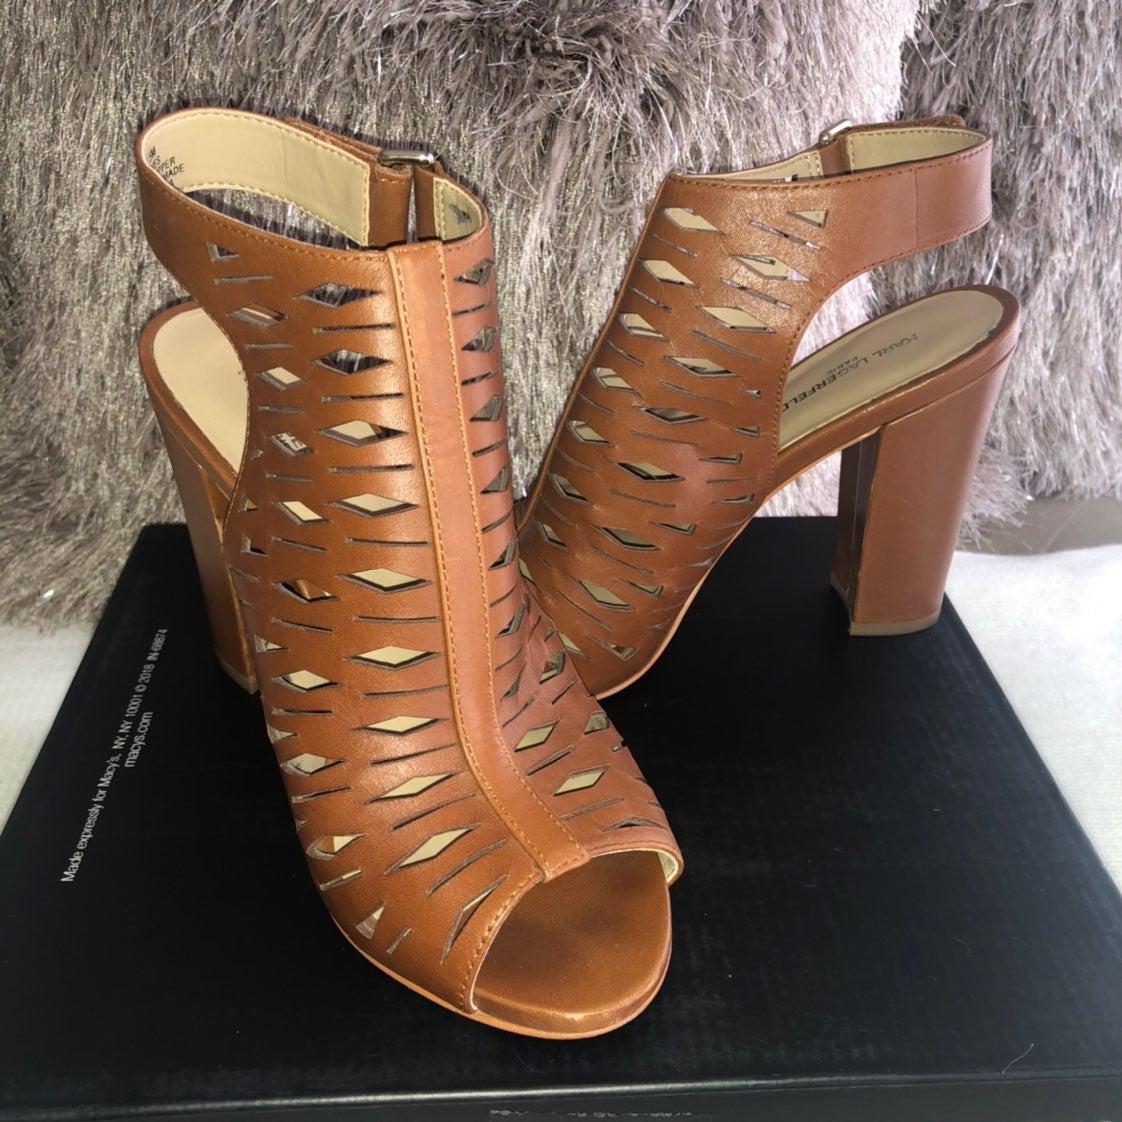 Karl Lagerfeld Rennes Block Heel Sandals